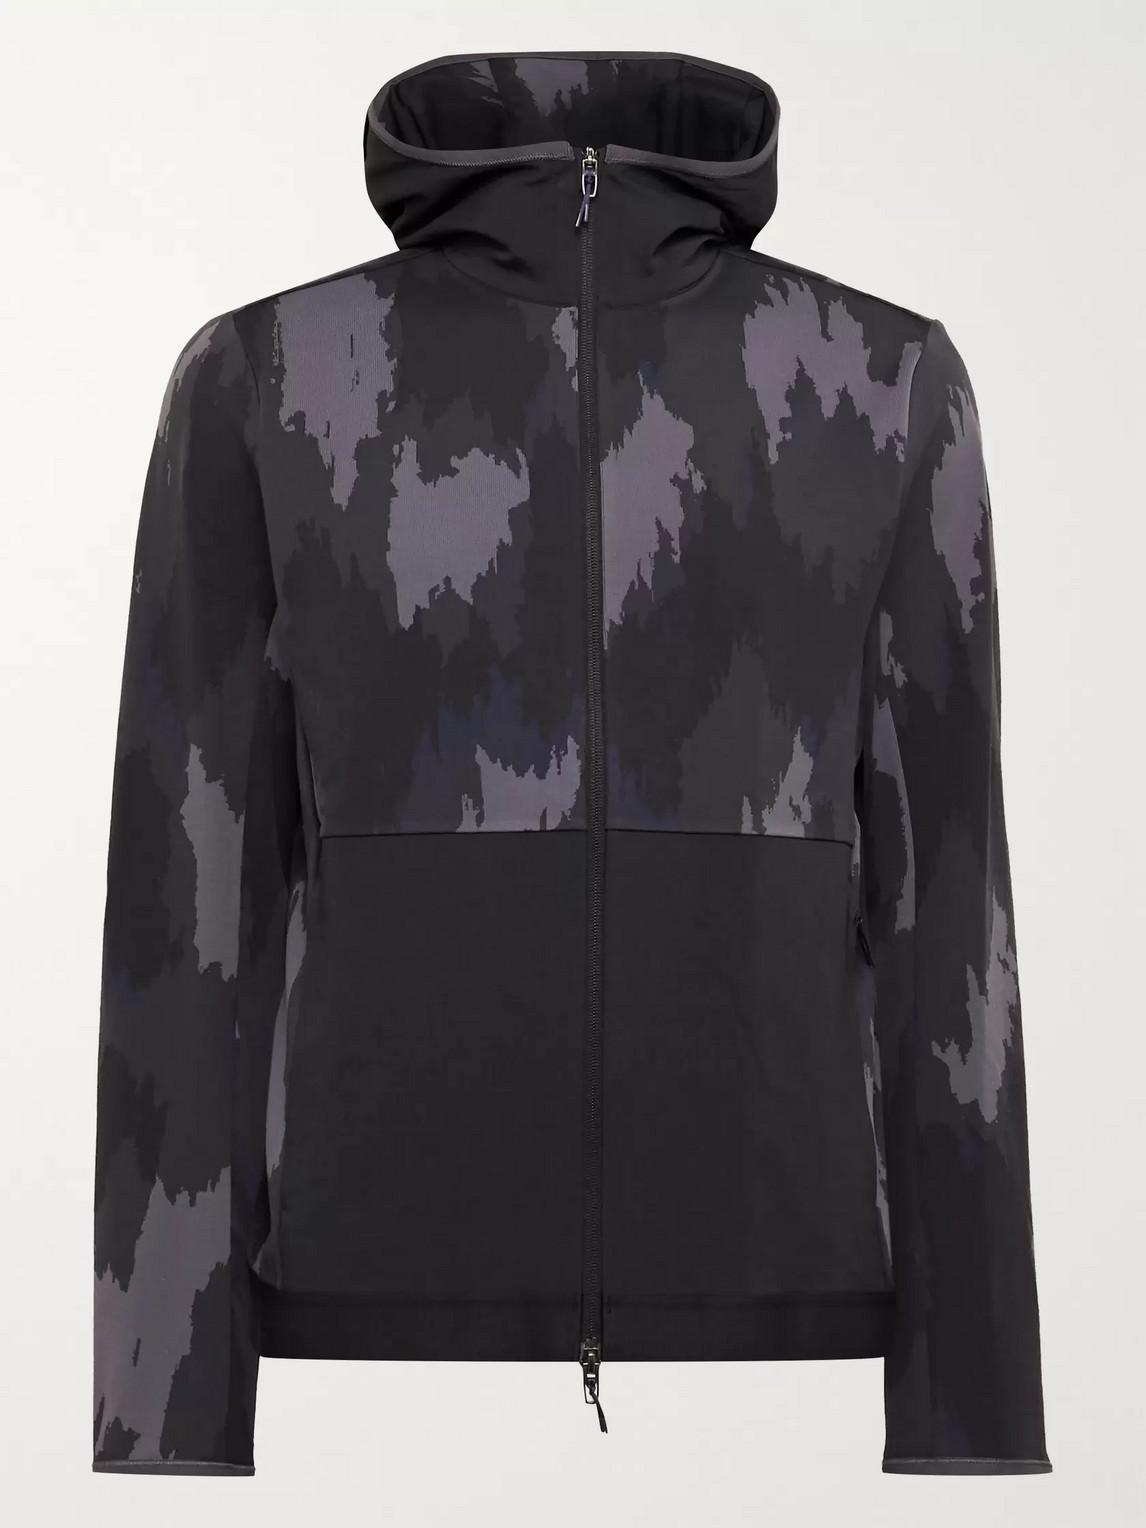 lululemon - robert geller take the moment printed full-on luon zip-up hoodie - men - gray